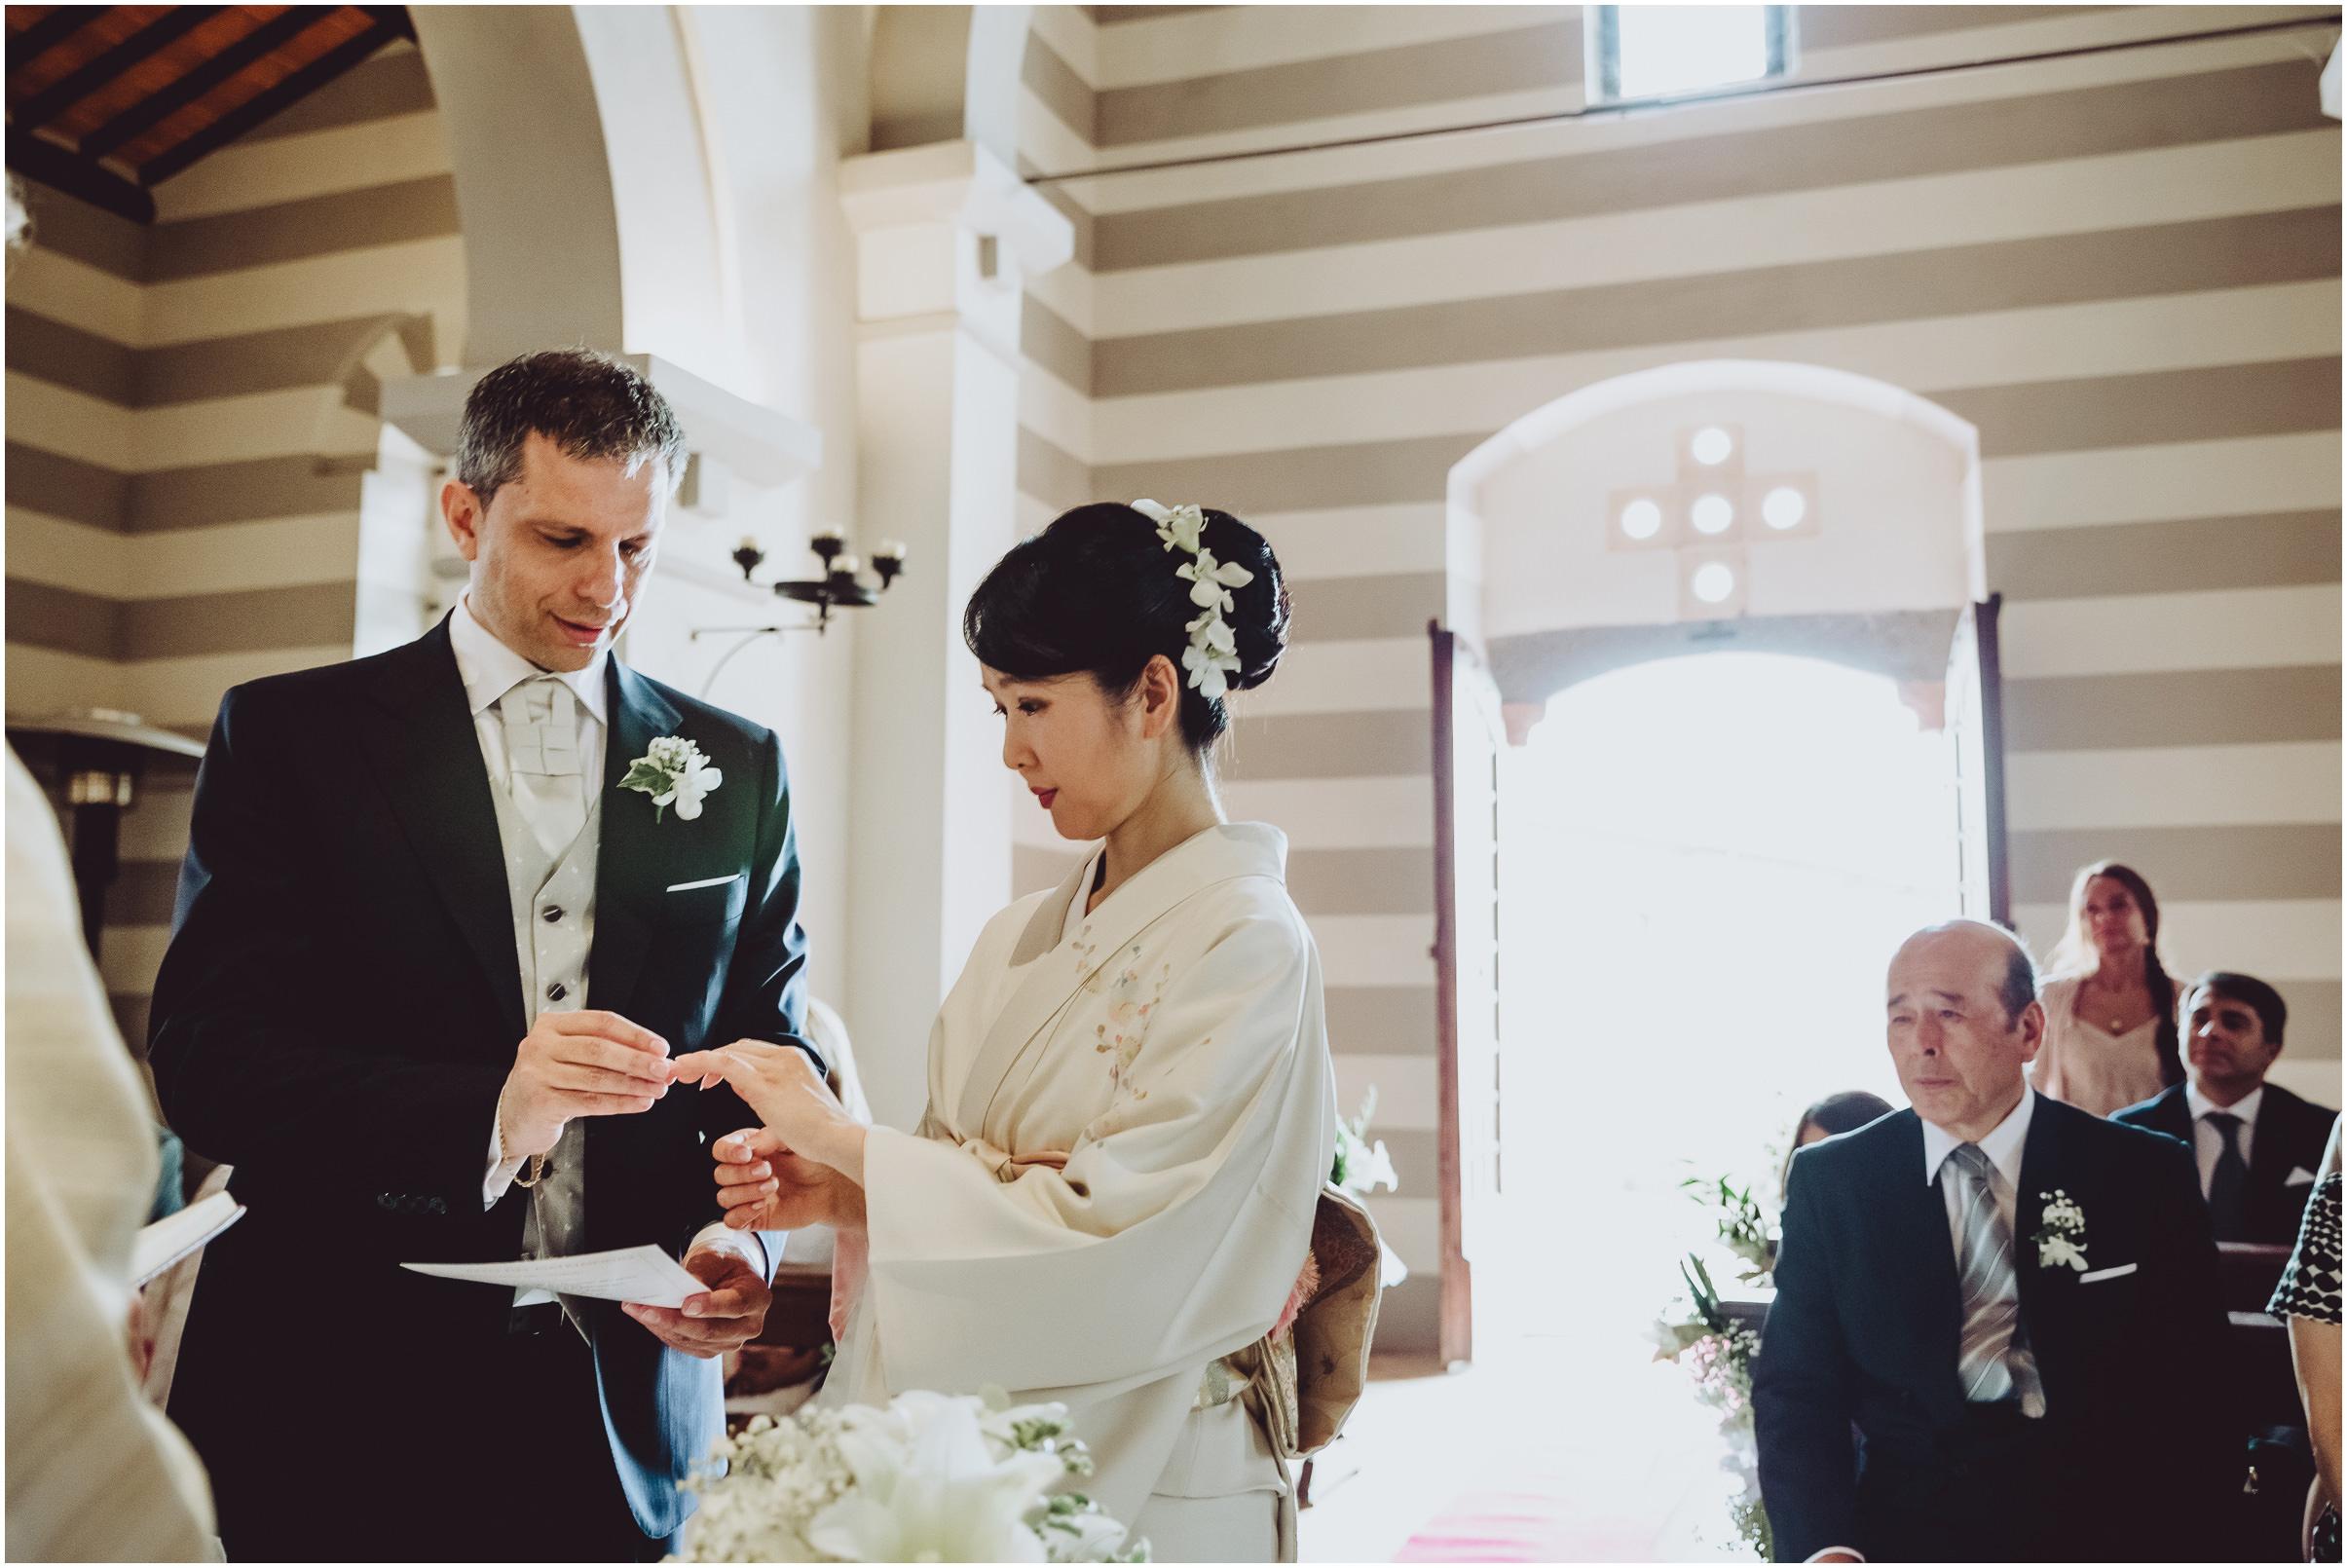 WEDDING-PHOTOGRAPHY-SARA-LORENZONI-FOTOGRAFIA-MATRIMONIO-ORVIETO-JUKA-ANTONELLO16